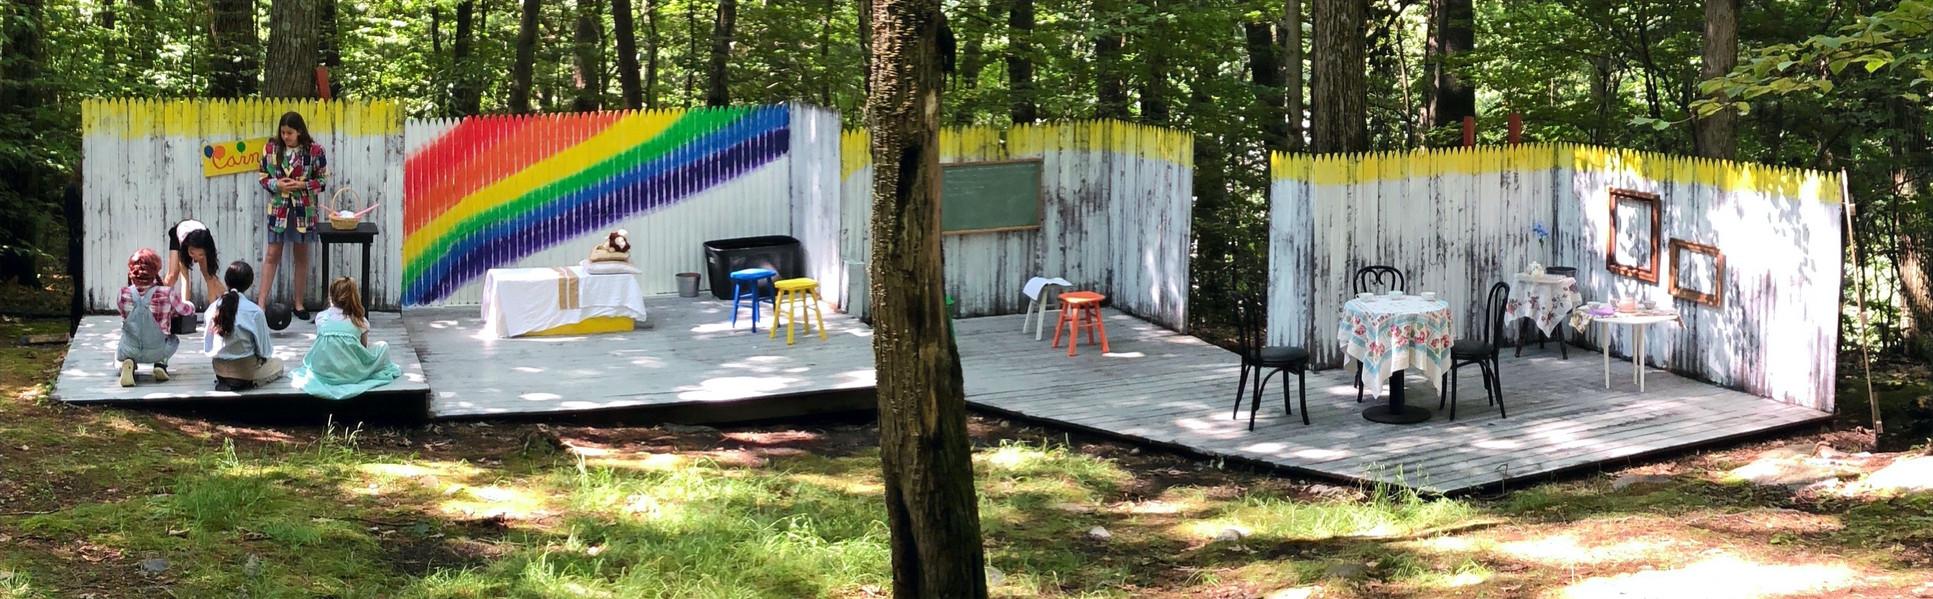 PIPPI LONGSTOKING Belvoir Terrace 2019